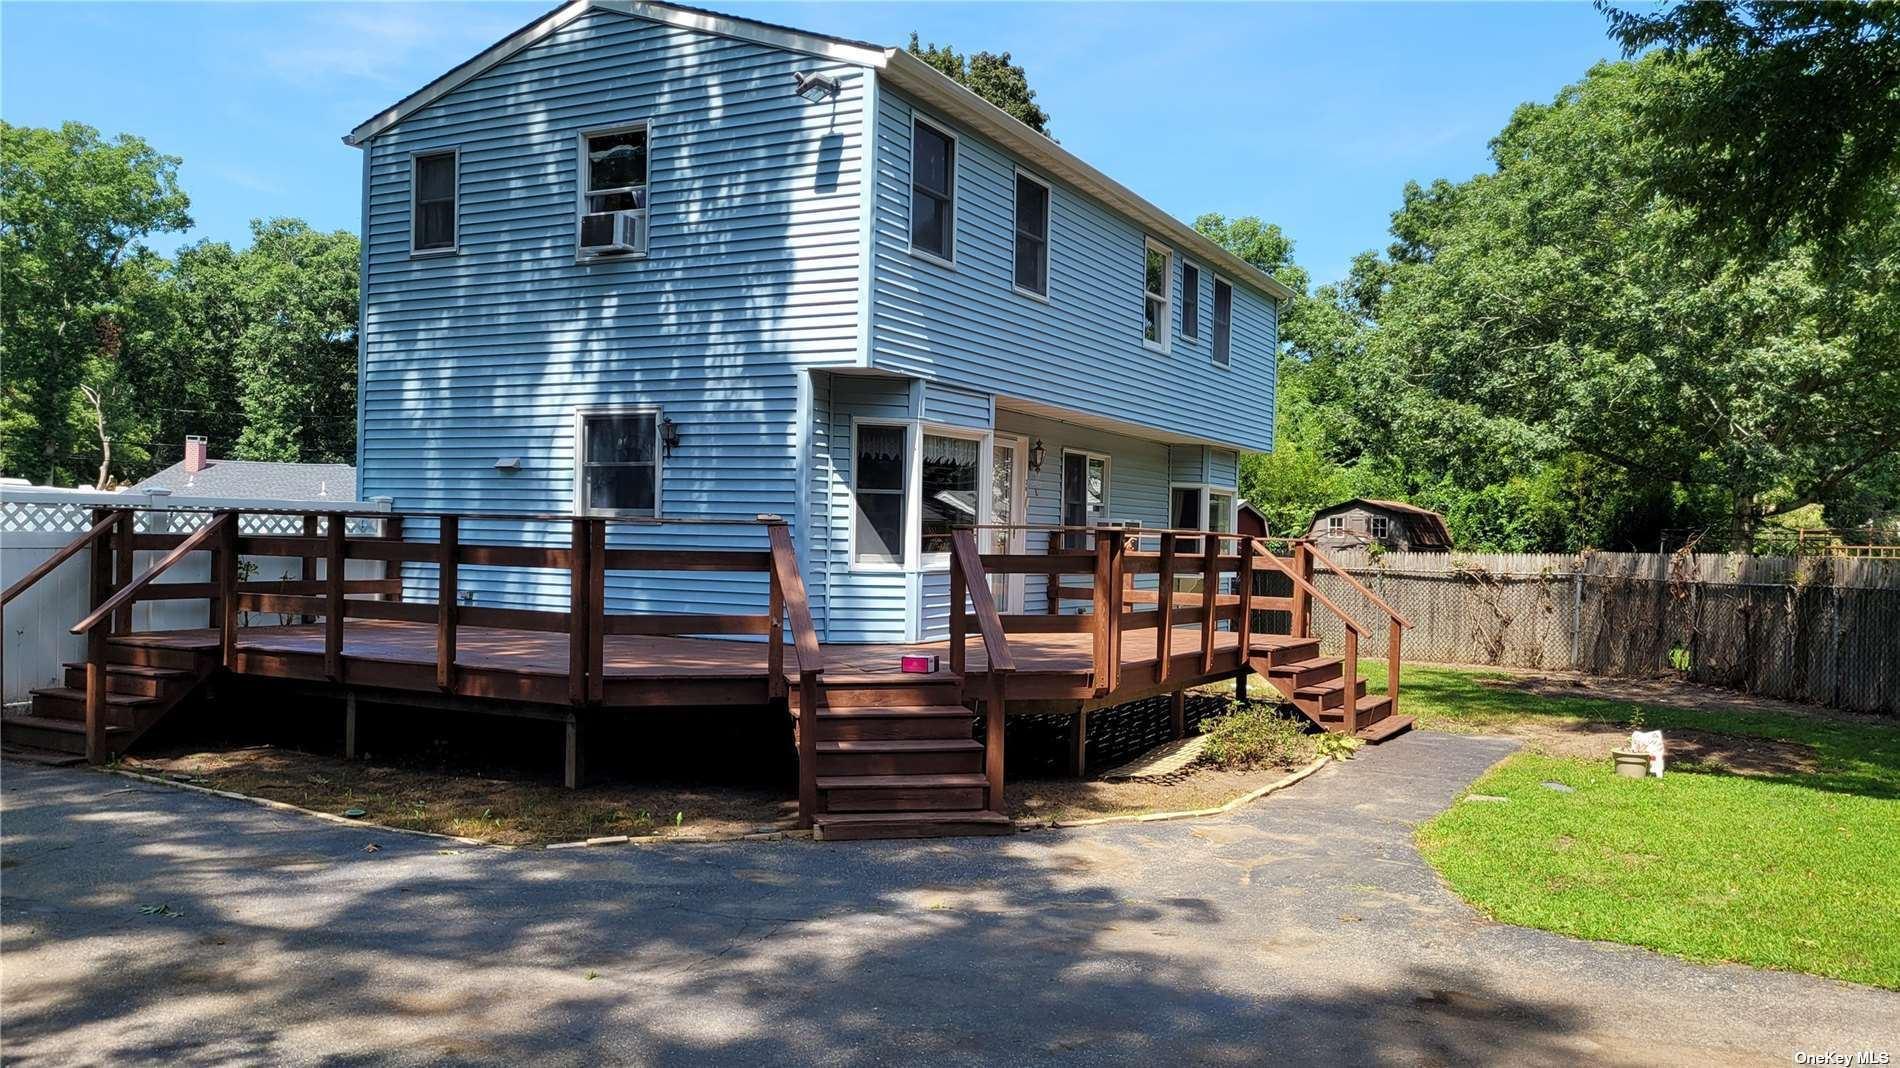 26 Half Moon Pond Road, Ridge, NY 11961 - MLS#: 3327402